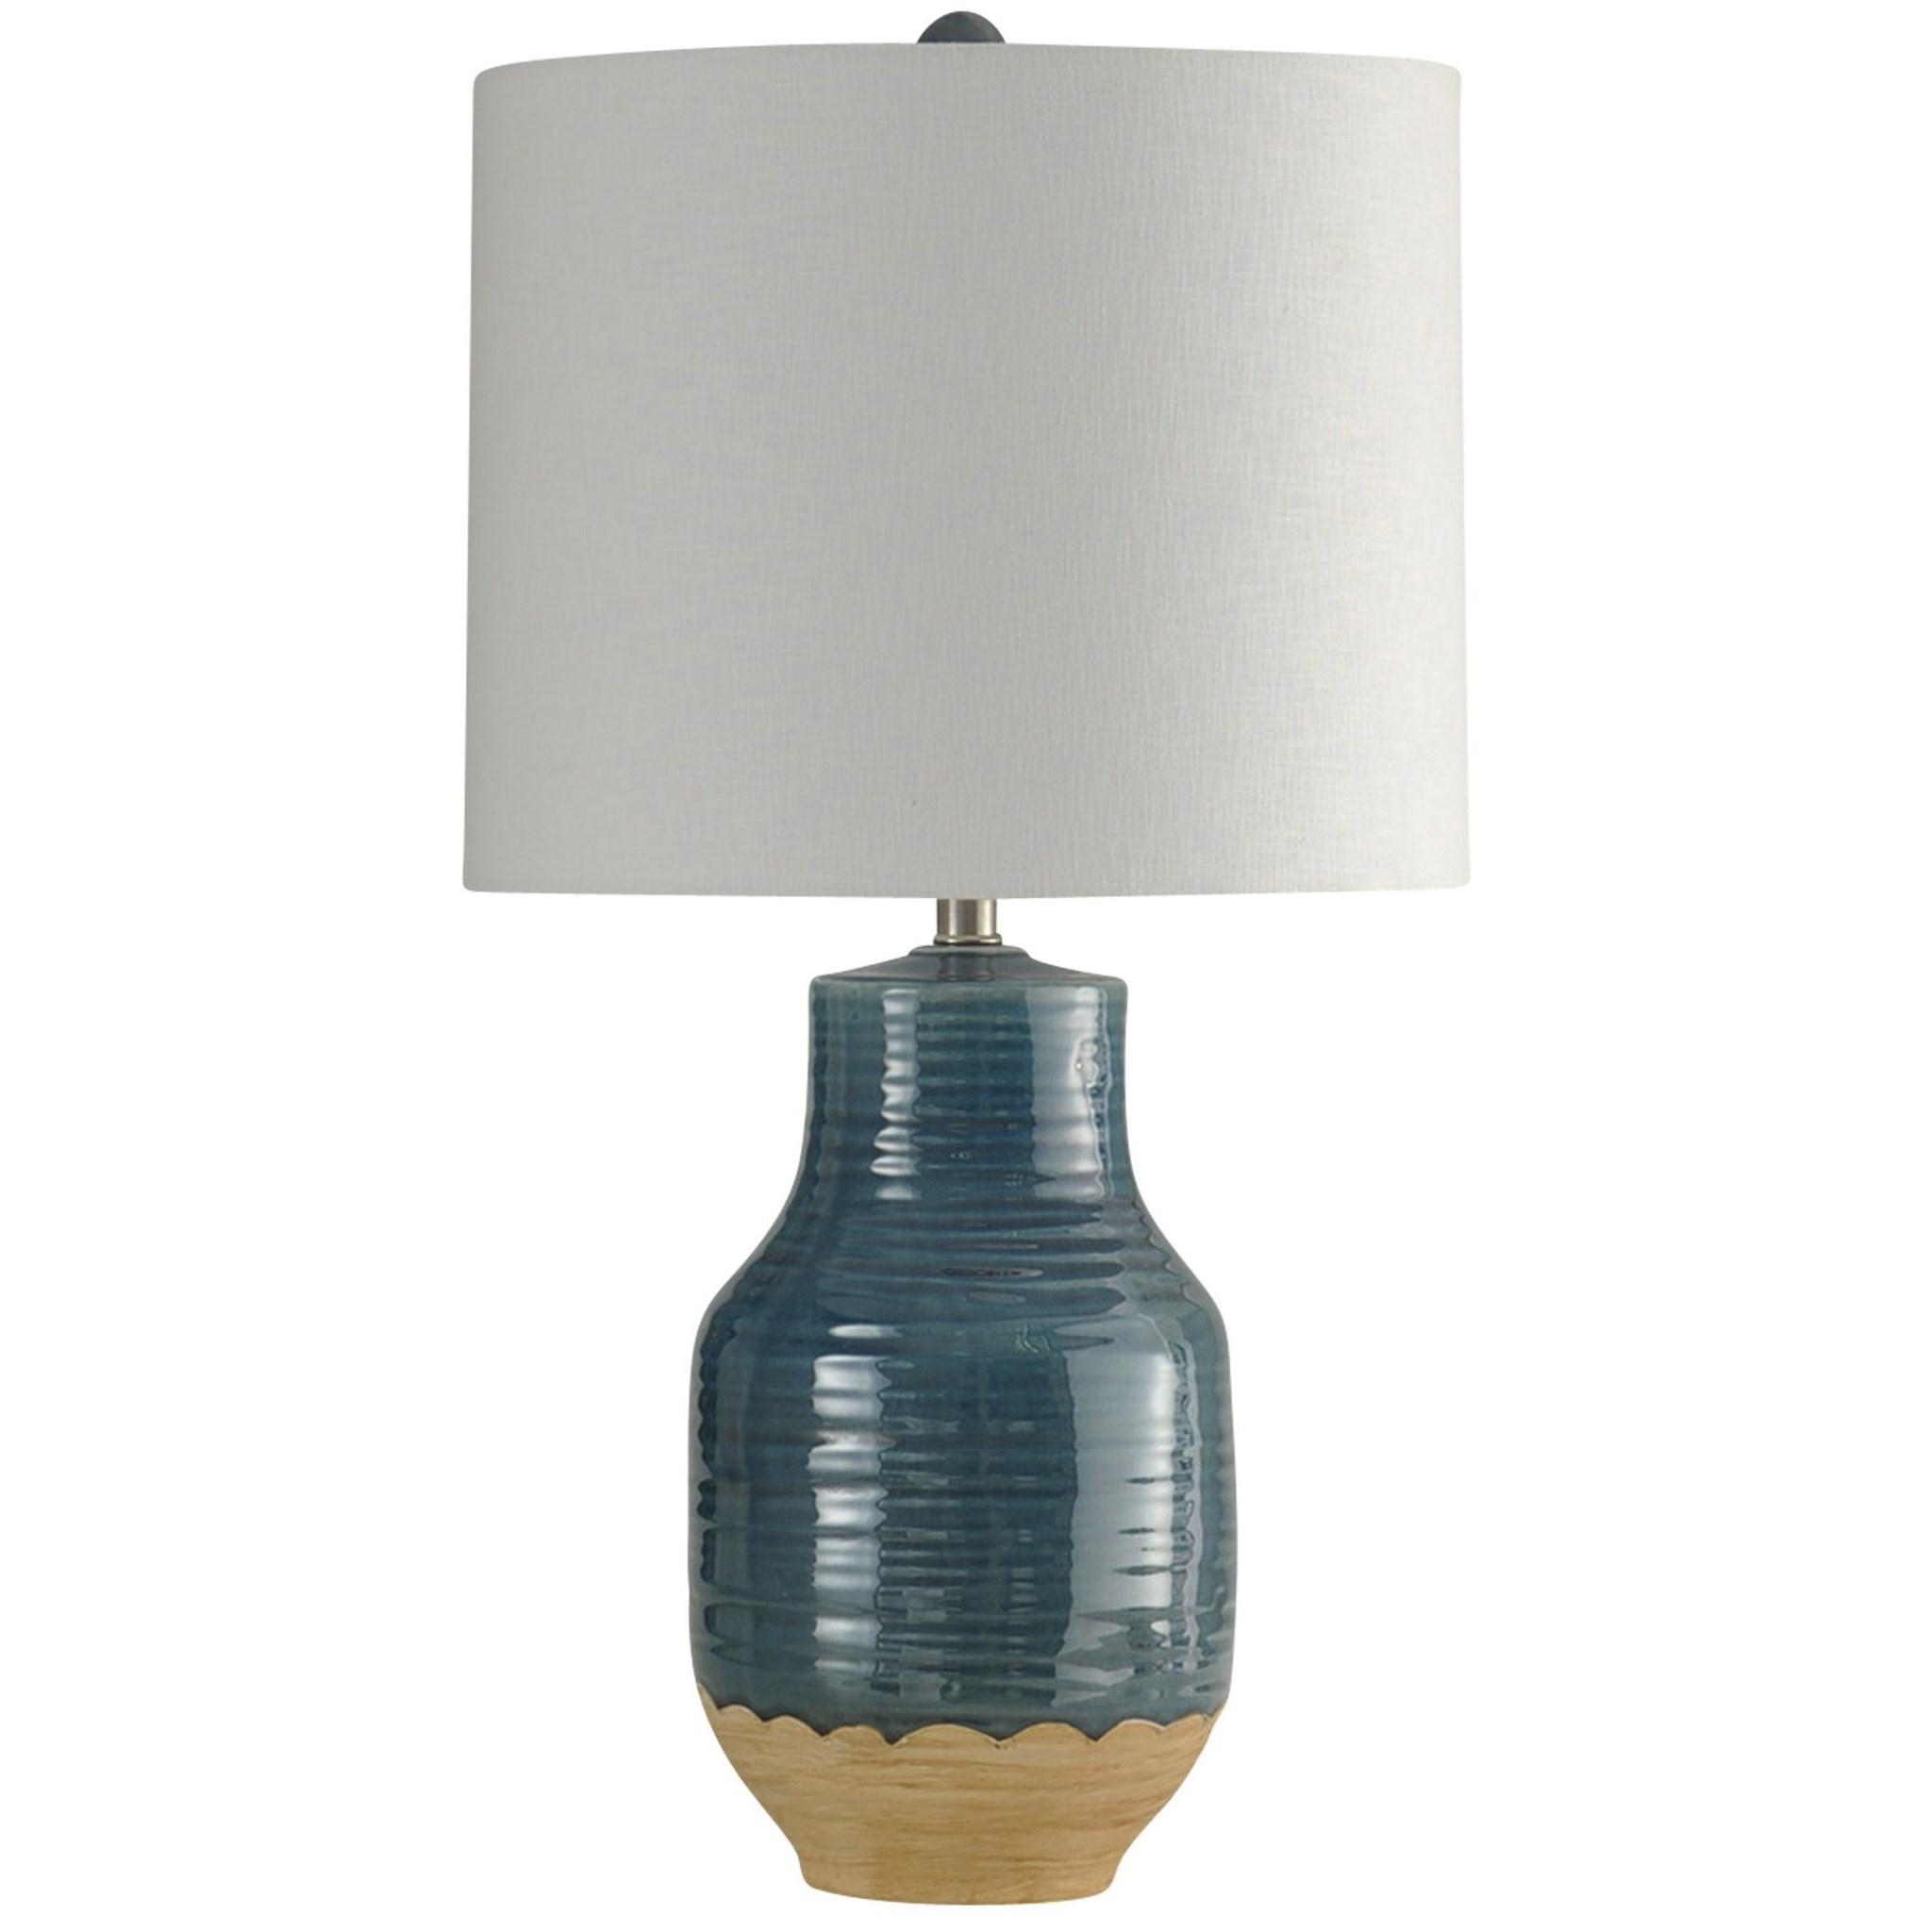 Lamps Prova Blue Dipped Ceramic Lamp at Ruby Gordon Home